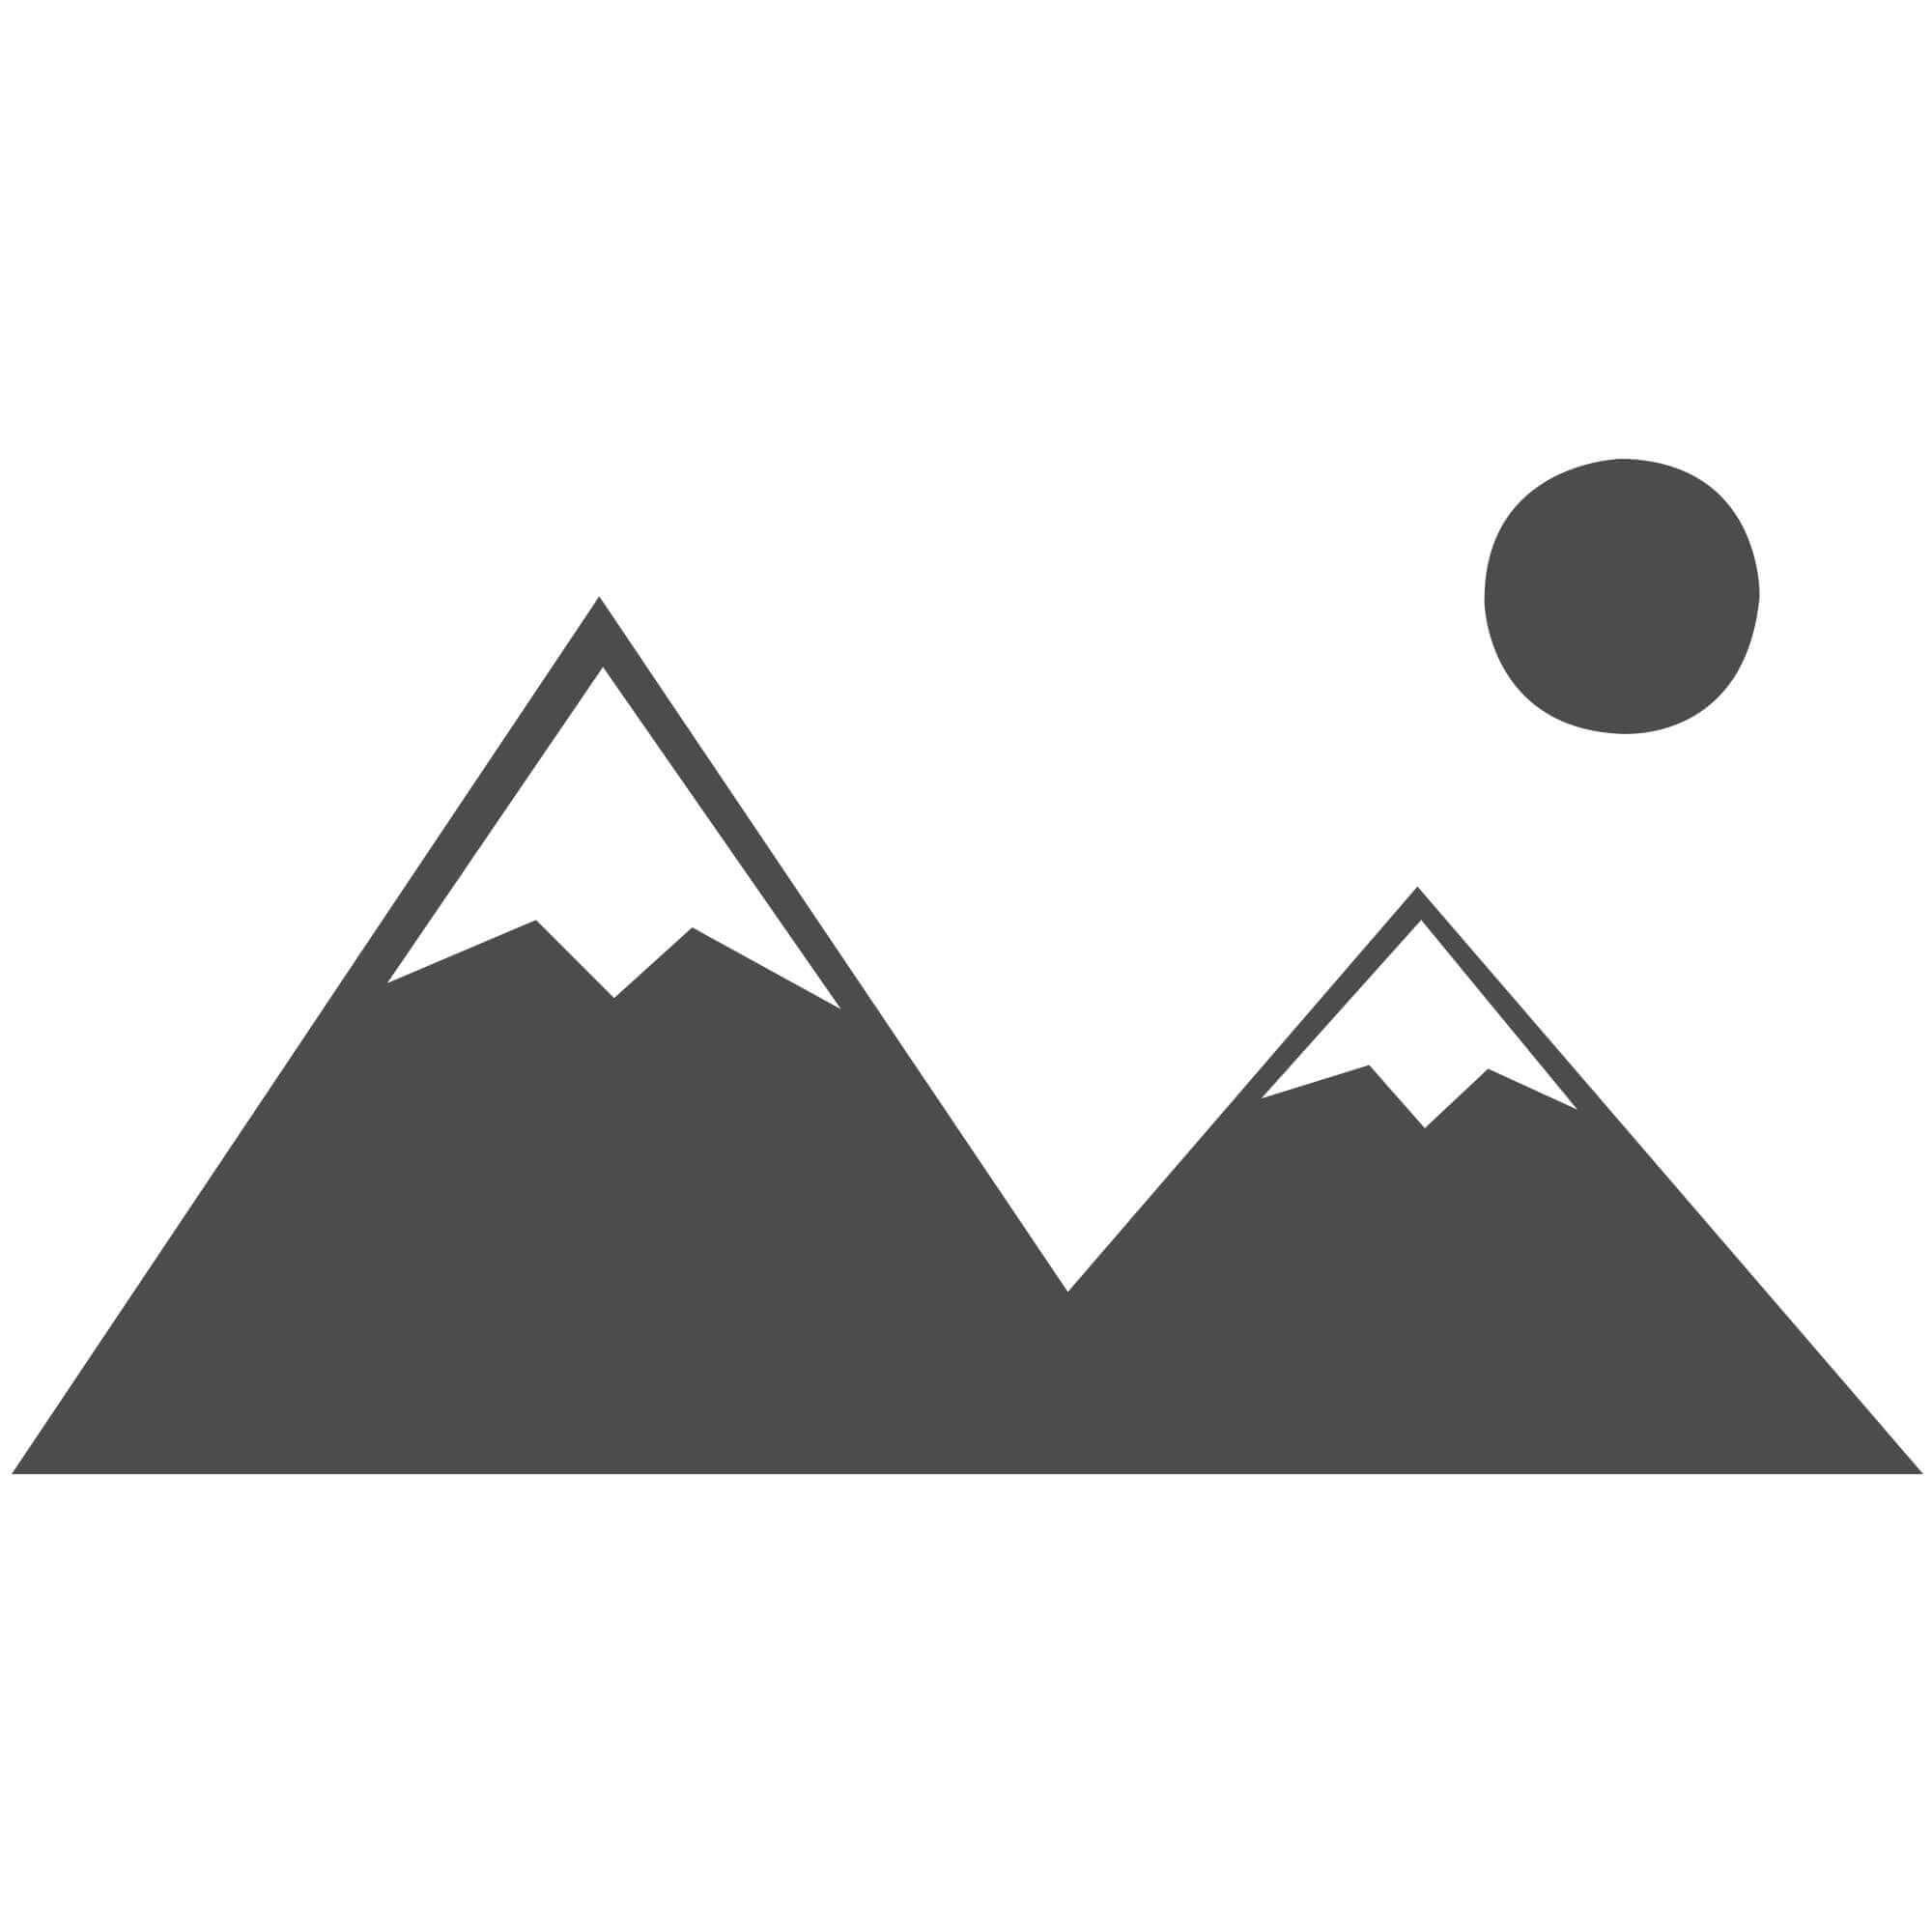 Persian Shiraz Tribal Wool Rug - 171 x 258 cm